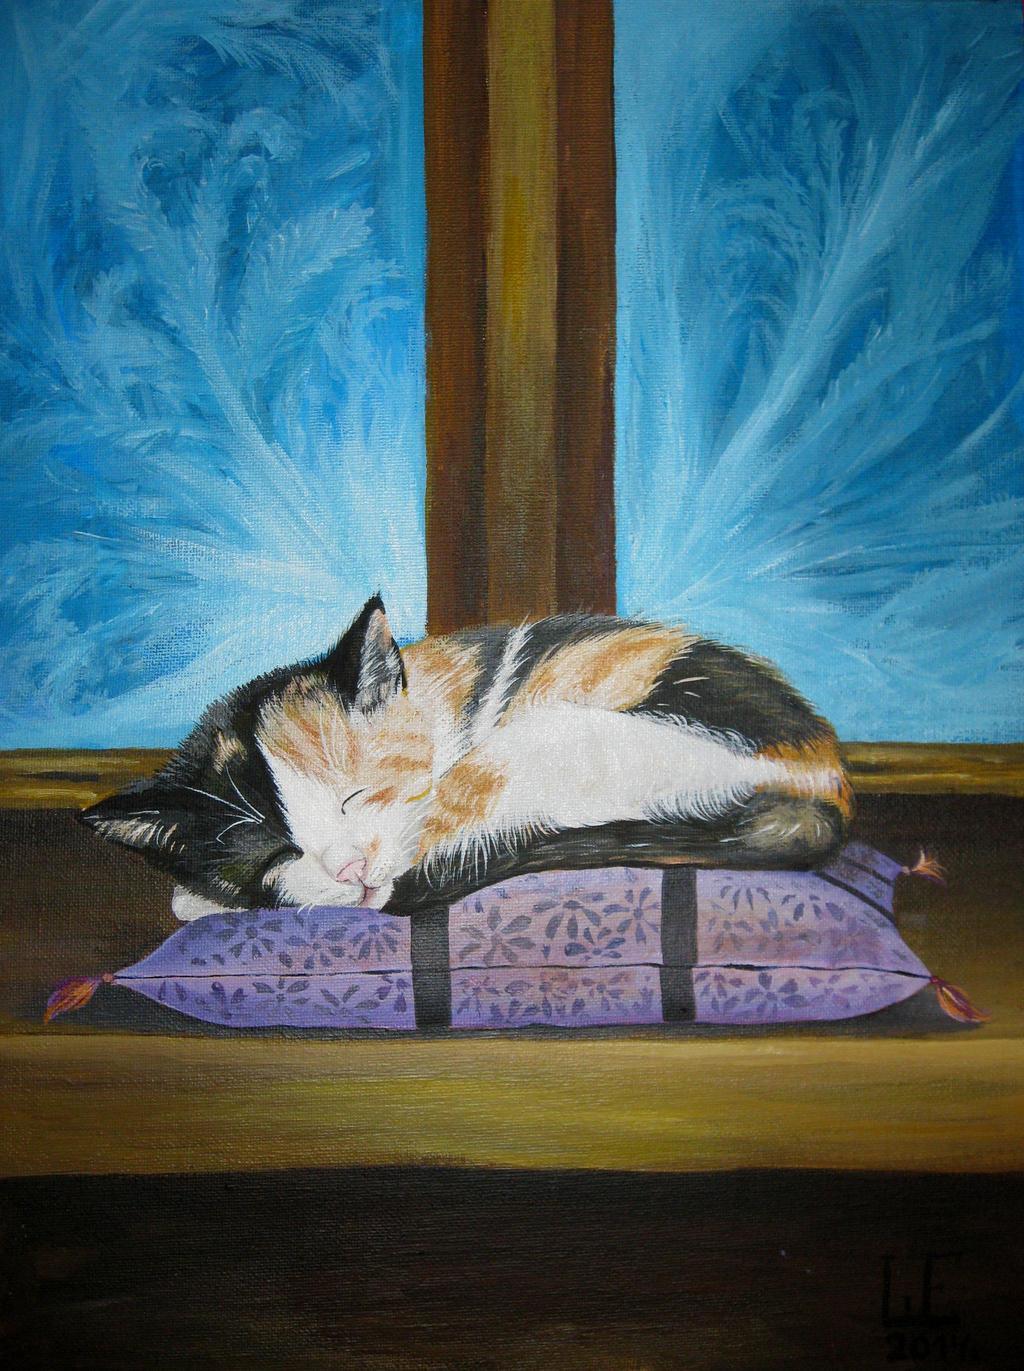 Cat 2 by Sonne91